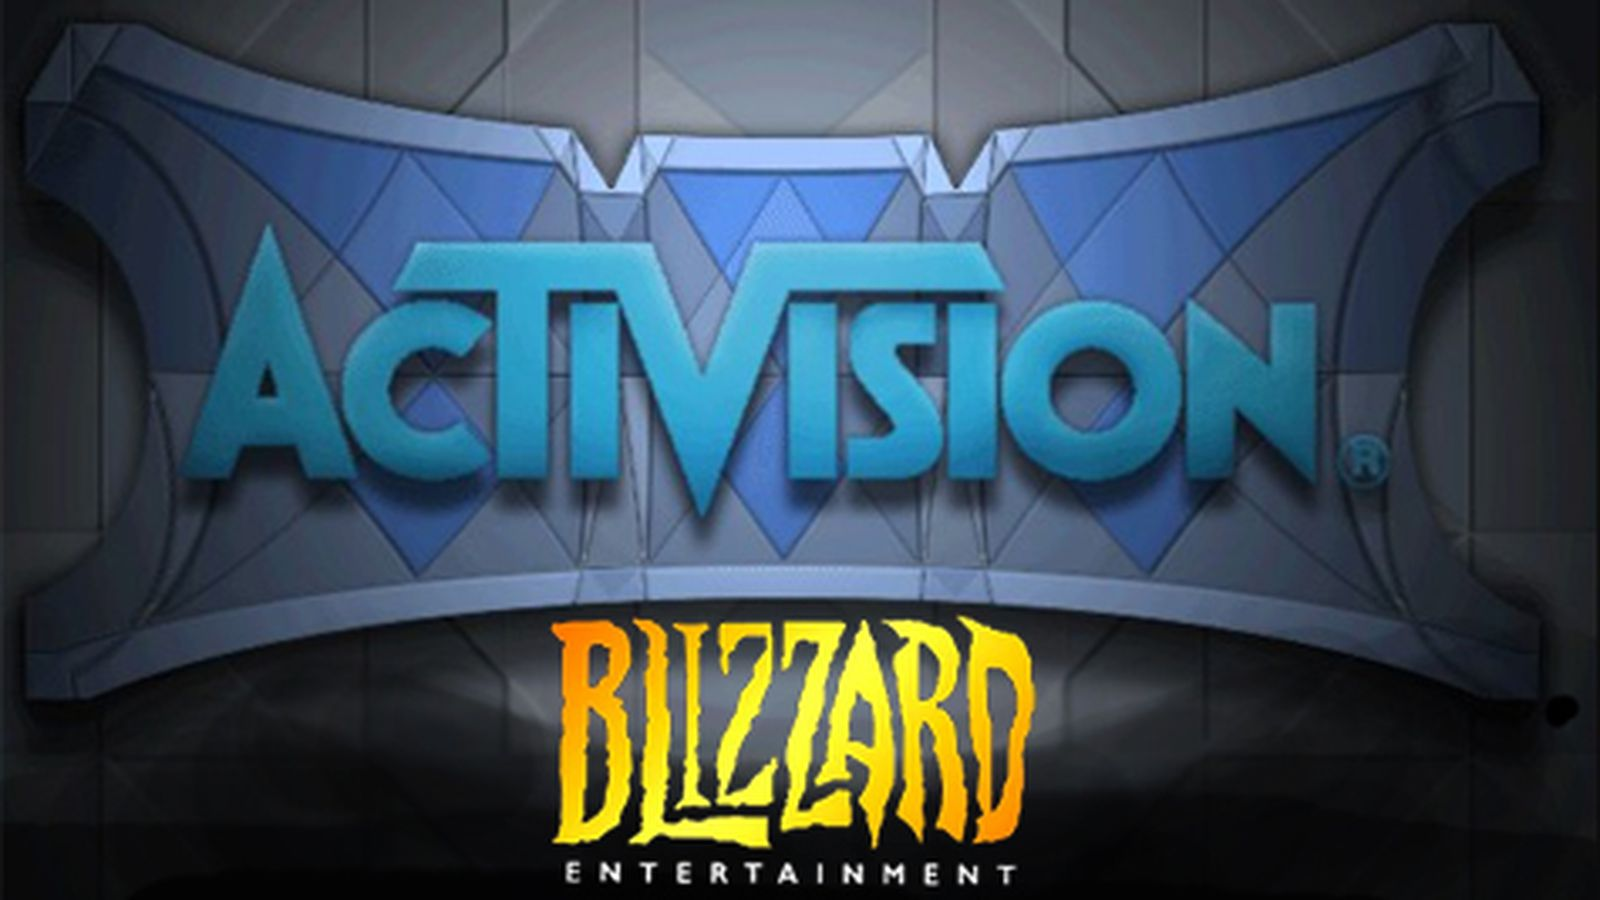 Activision Blizzard Stock